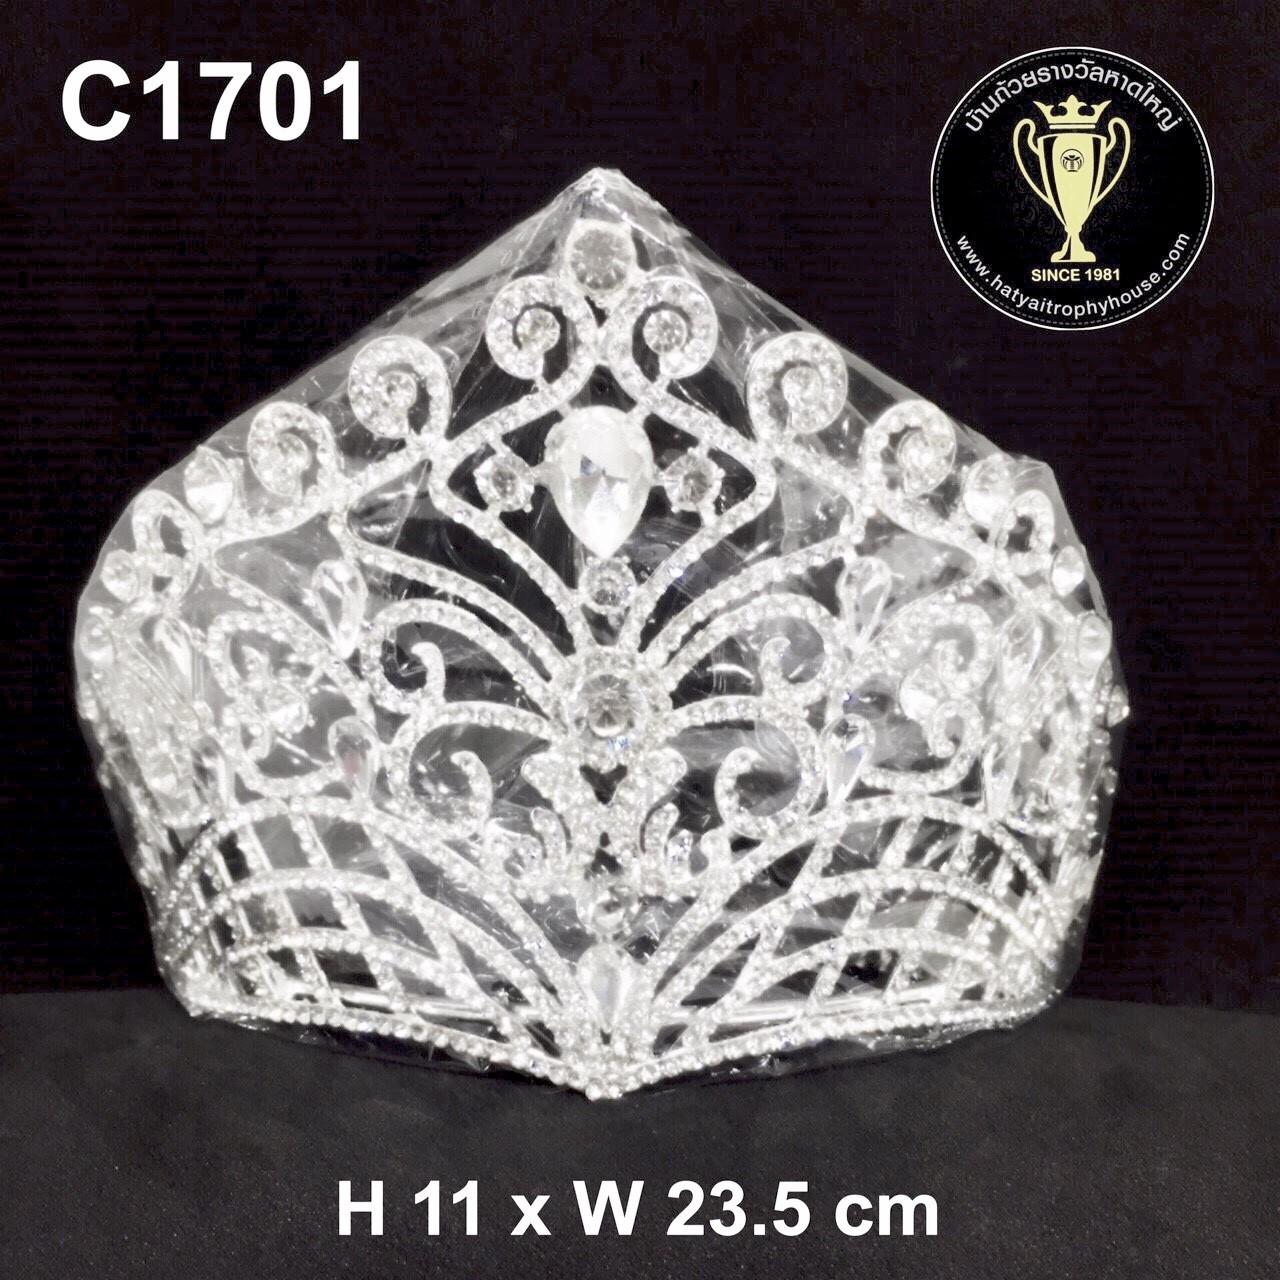 C1701